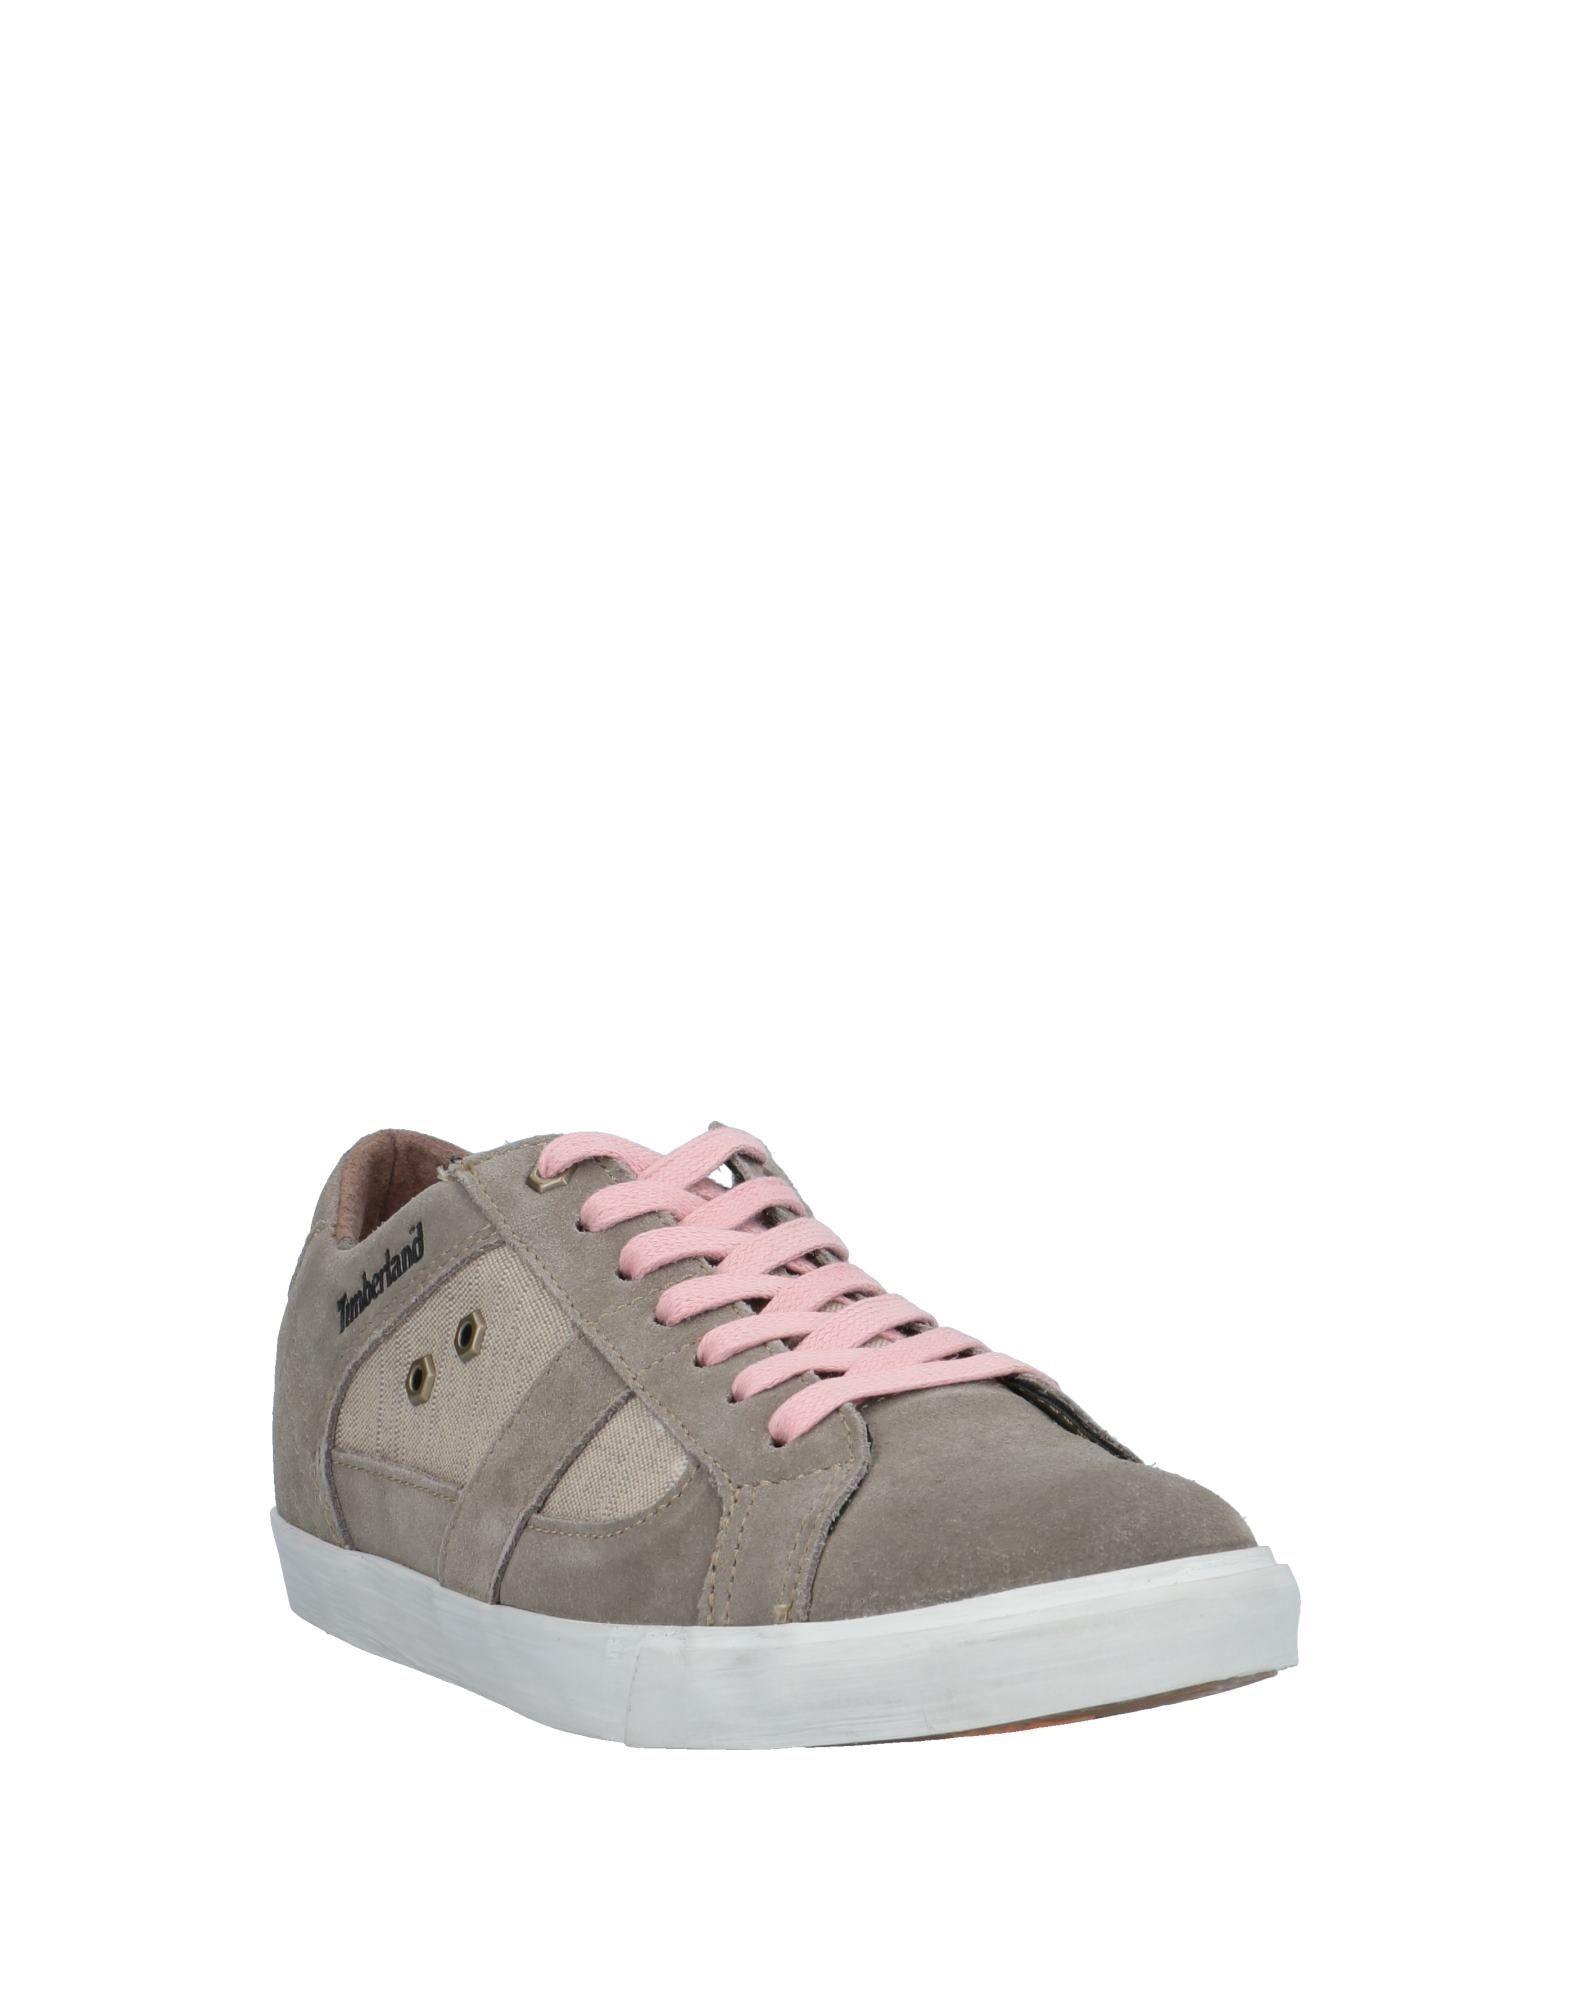 Timberland - Footwear - Low-tops & Sneakers - On Yoox.com